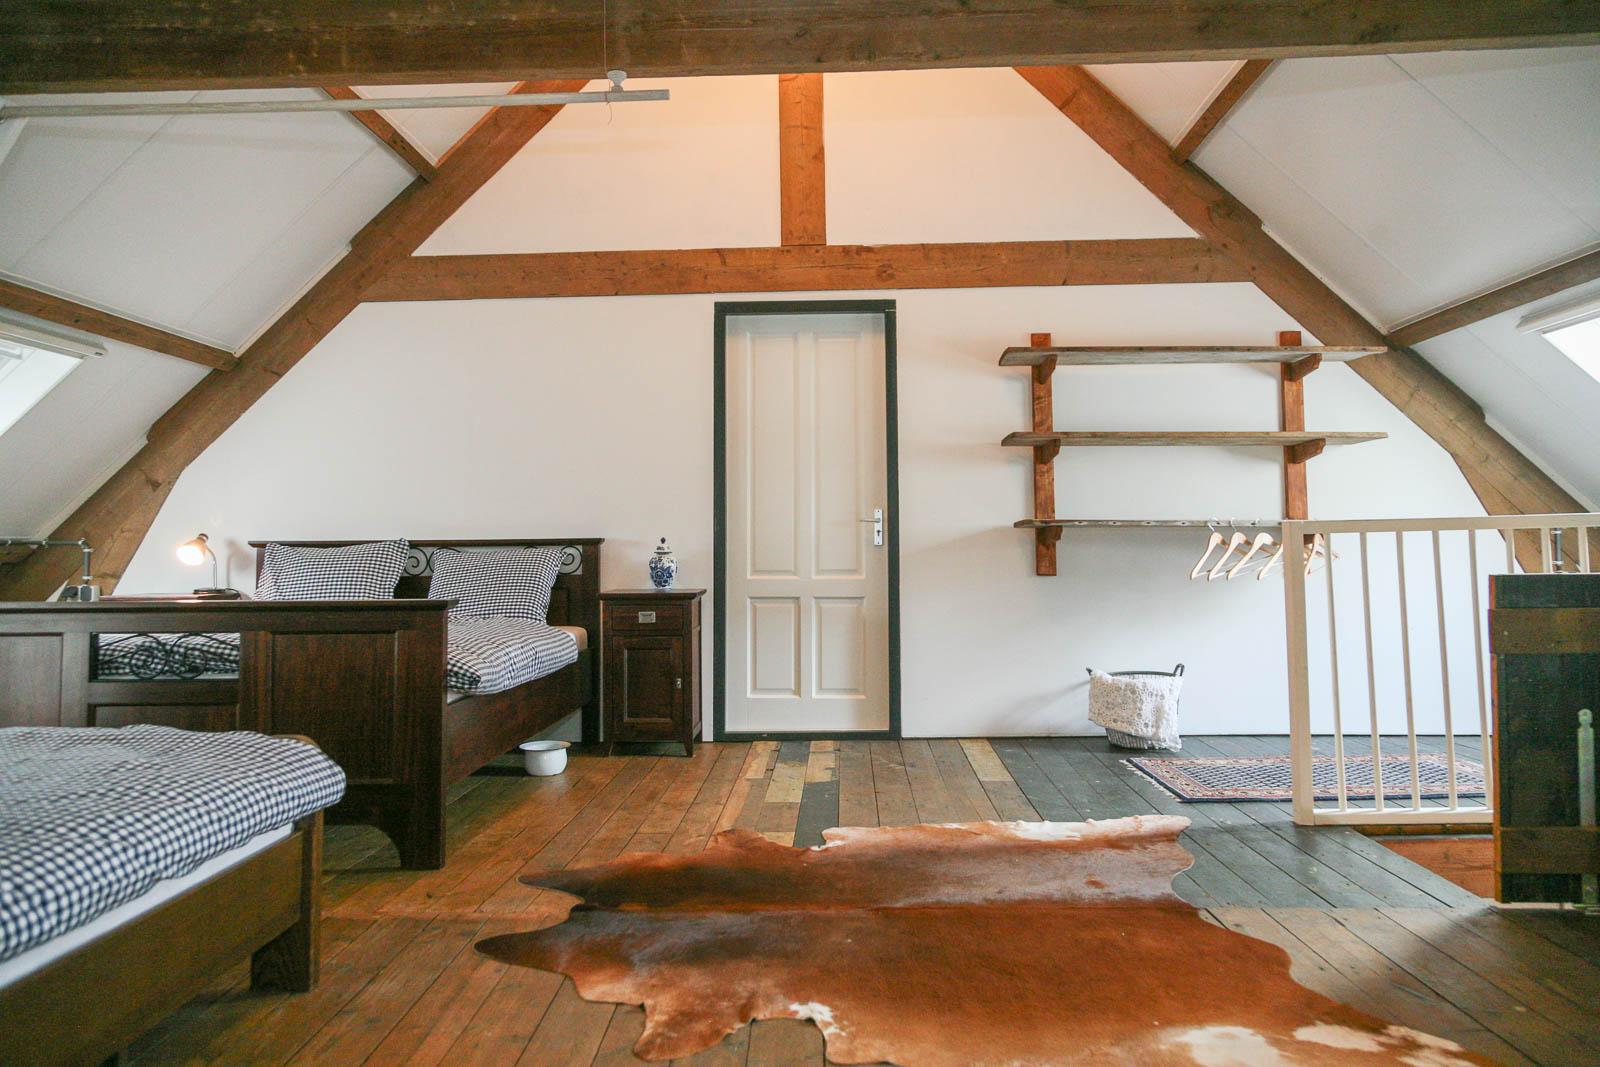 Hillegondahoeve-De Oude Stal-1445